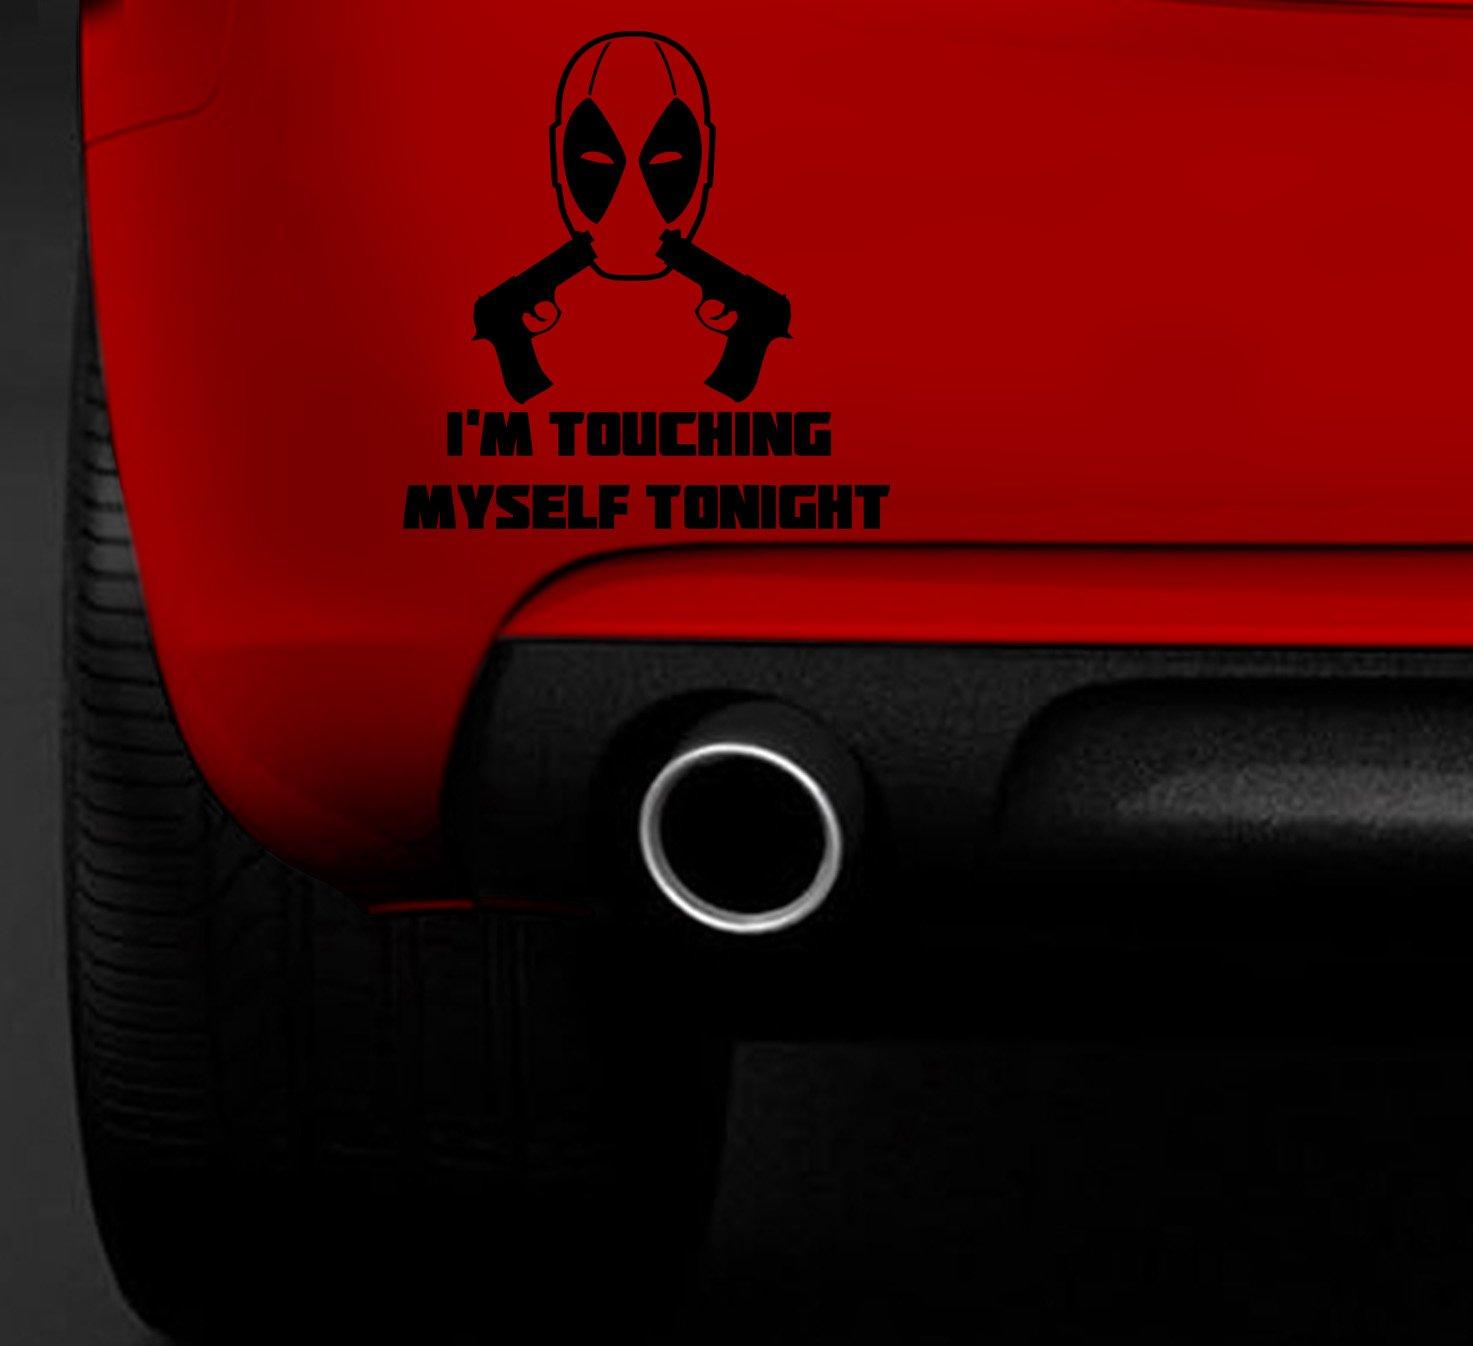 Deadpool car bumper sticker